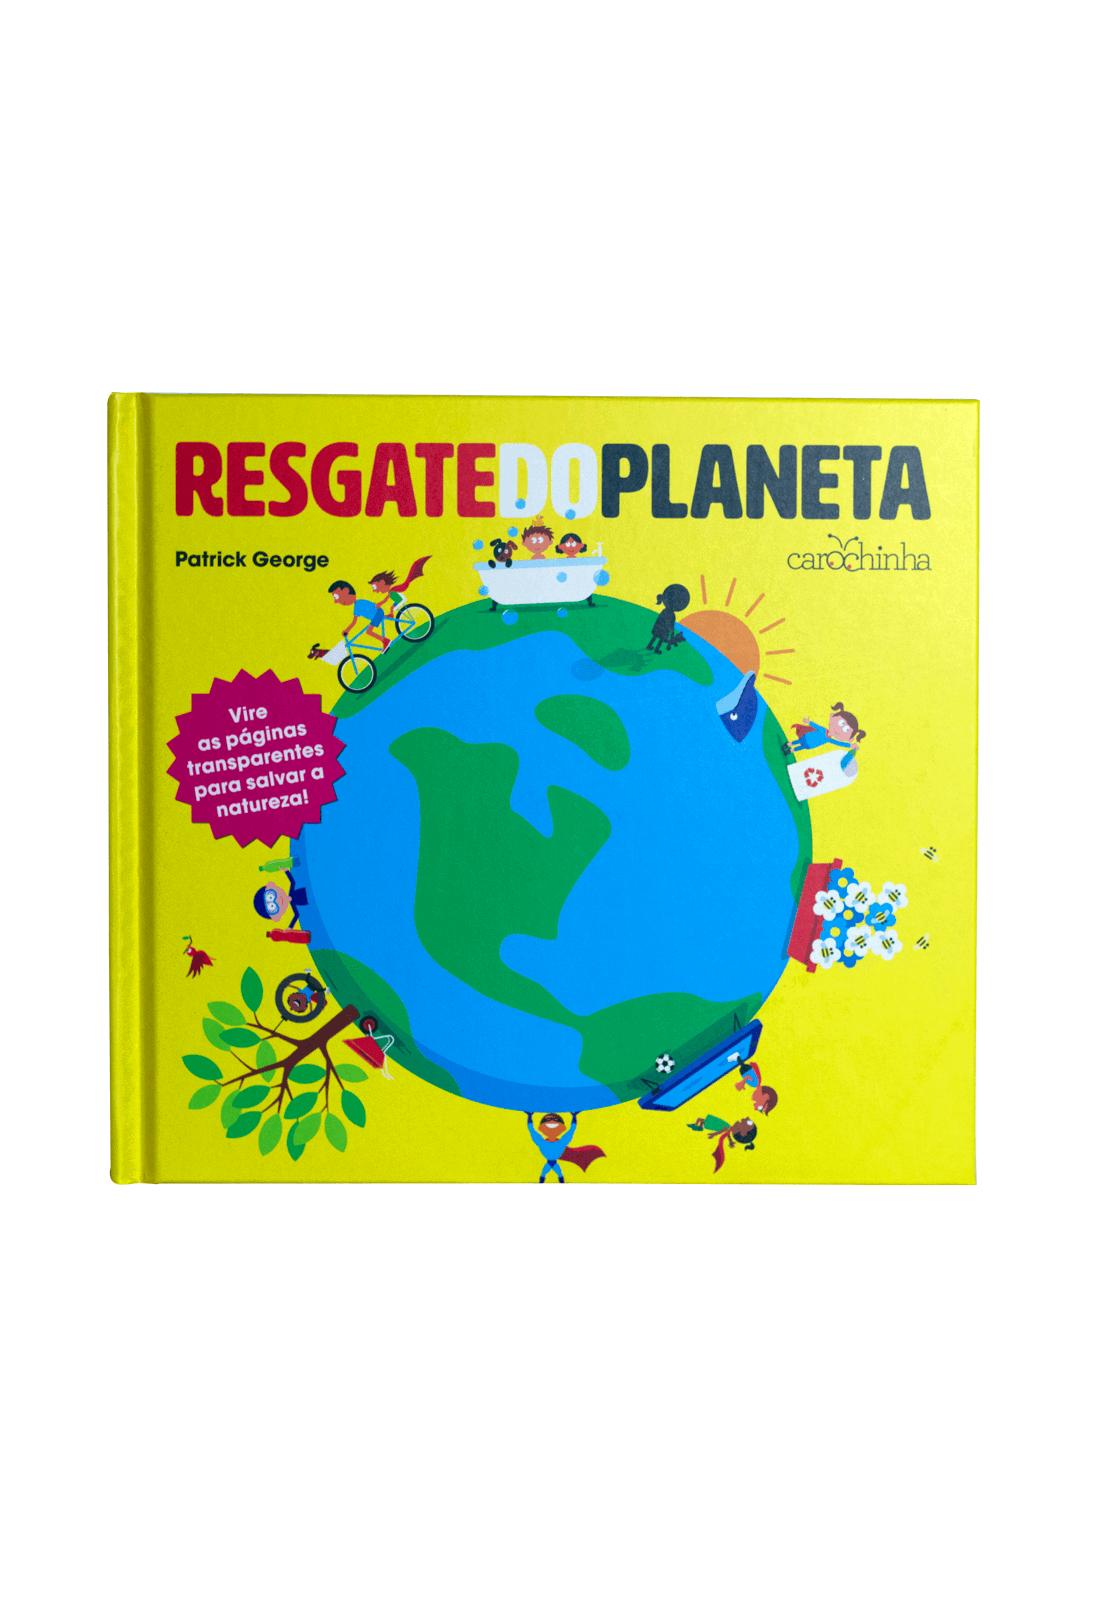 resgate-do-planeta-vire-e-descubra